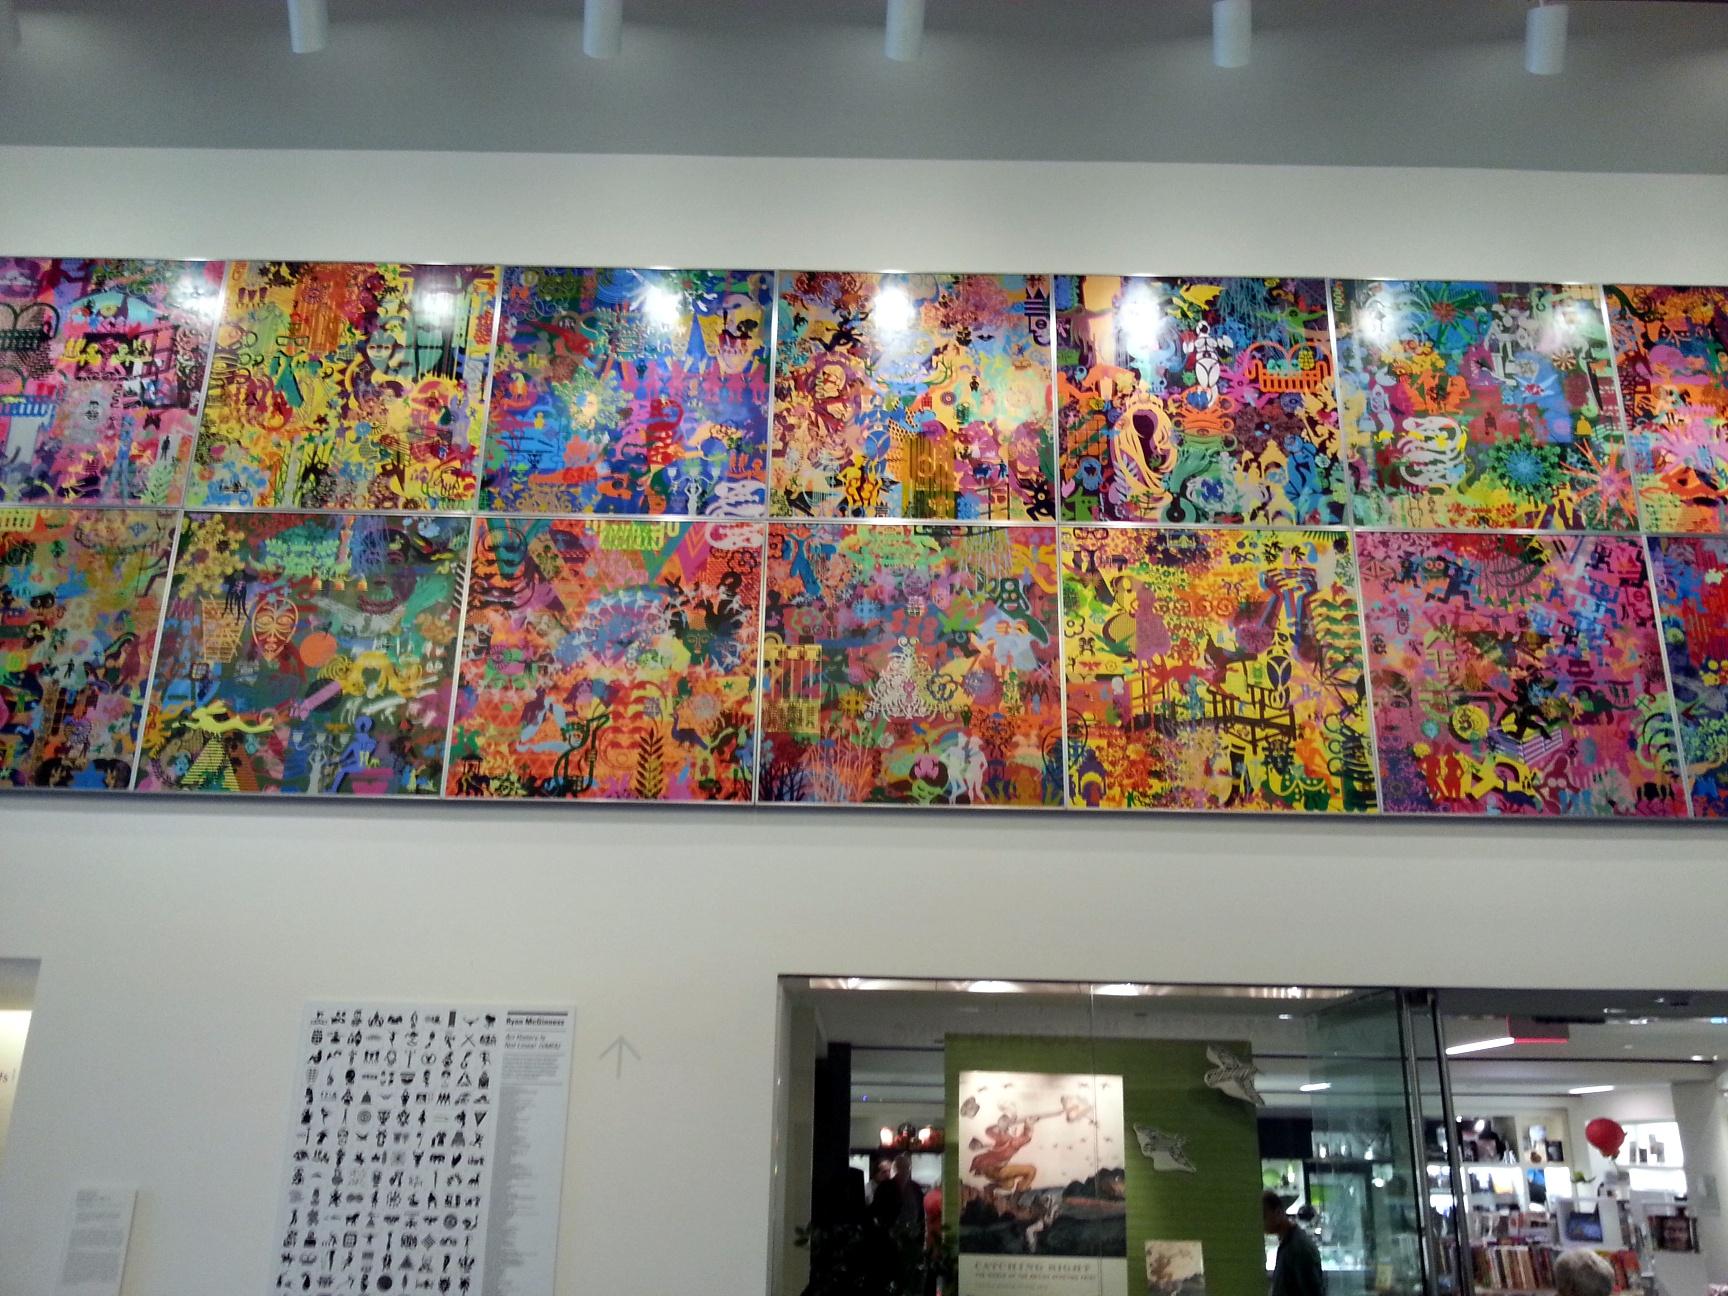 myartlook | ArtLook, LLC, art consultant Denver, residential art ...